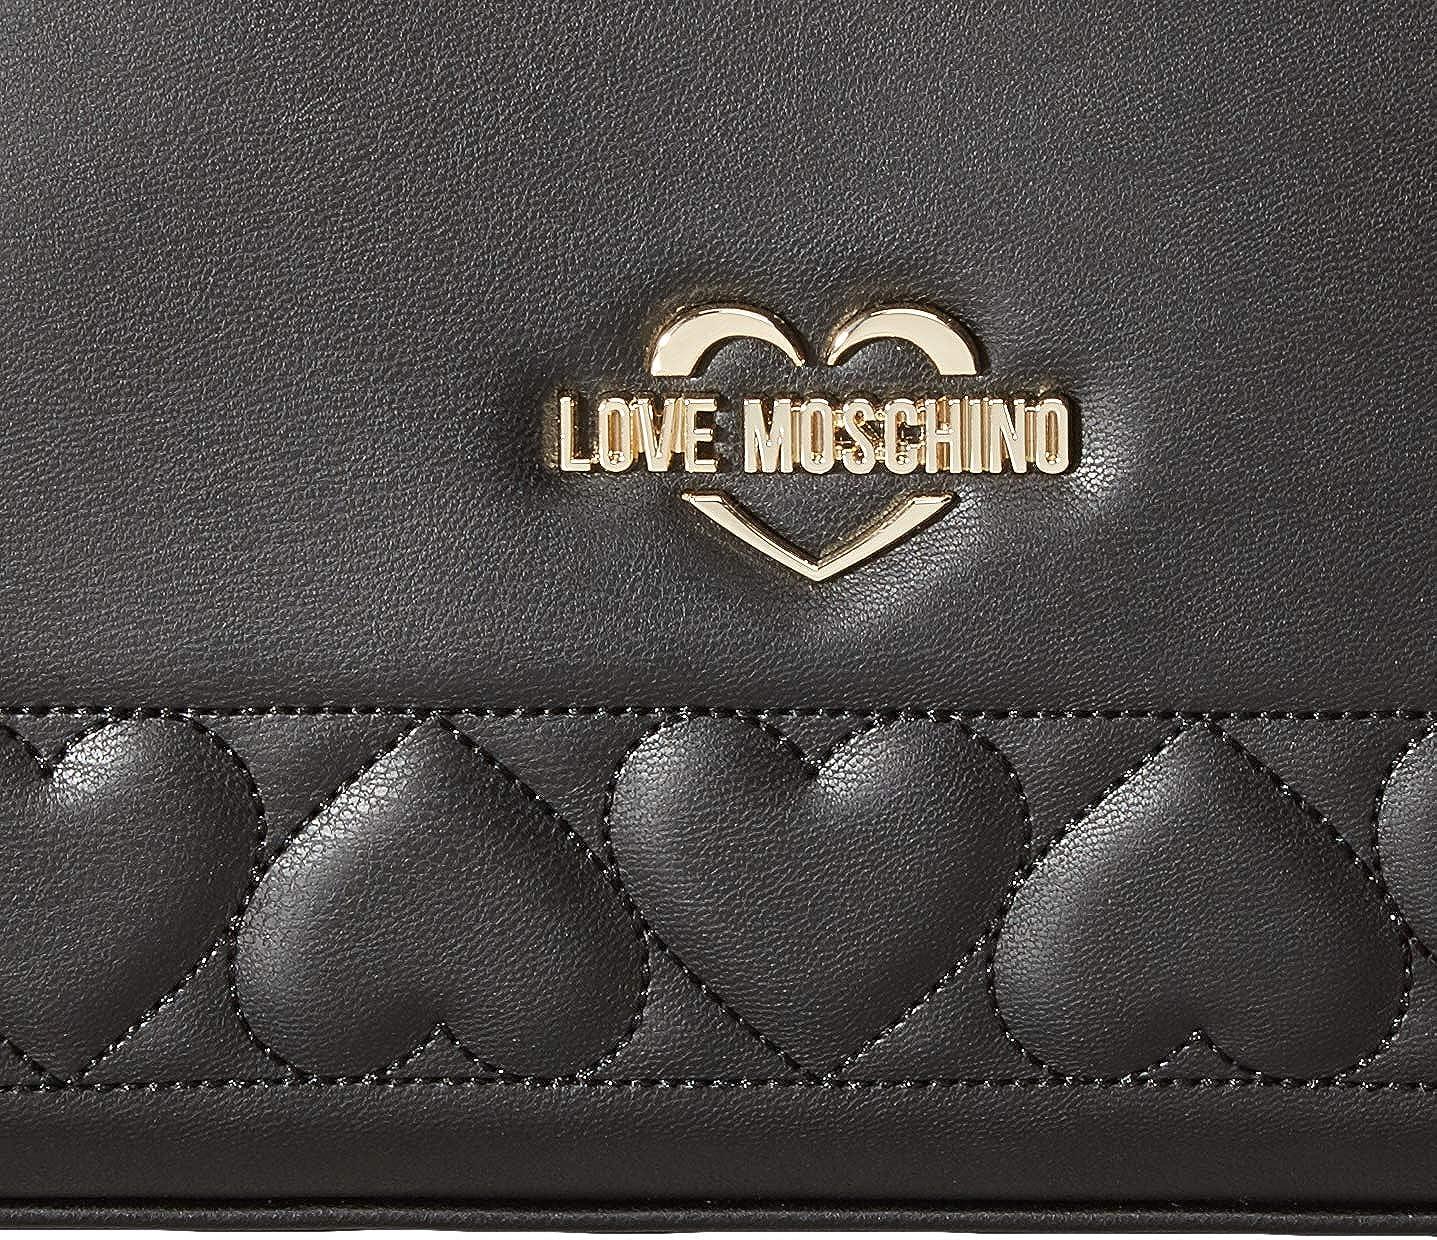 Love Moschino Sac à main femme ou à bandoulière article JC4085PP18LO BORSA NAPPA PU - cm.36 x 24 x 12 Noir (Nero)